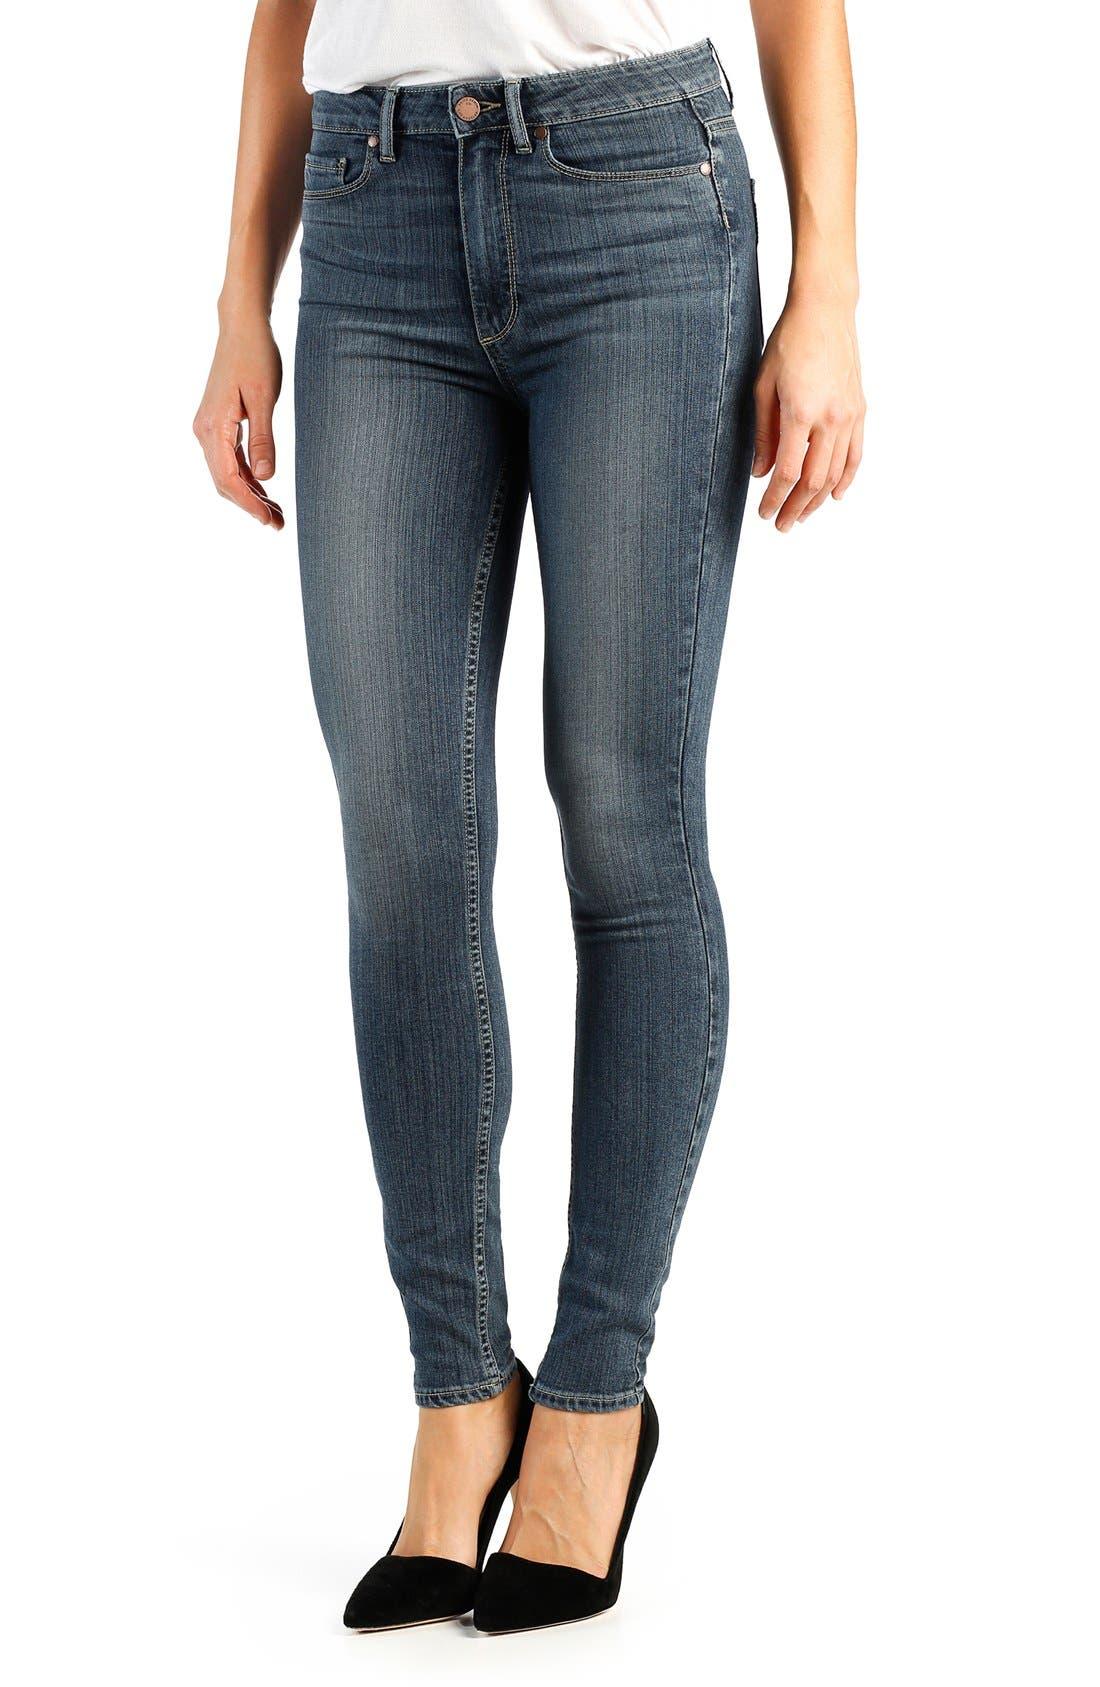 Alternate Image 1 Selected - Paige Denim 'Transcend - Margot' High Rise Ultra Skinny Jeans (Atlas)